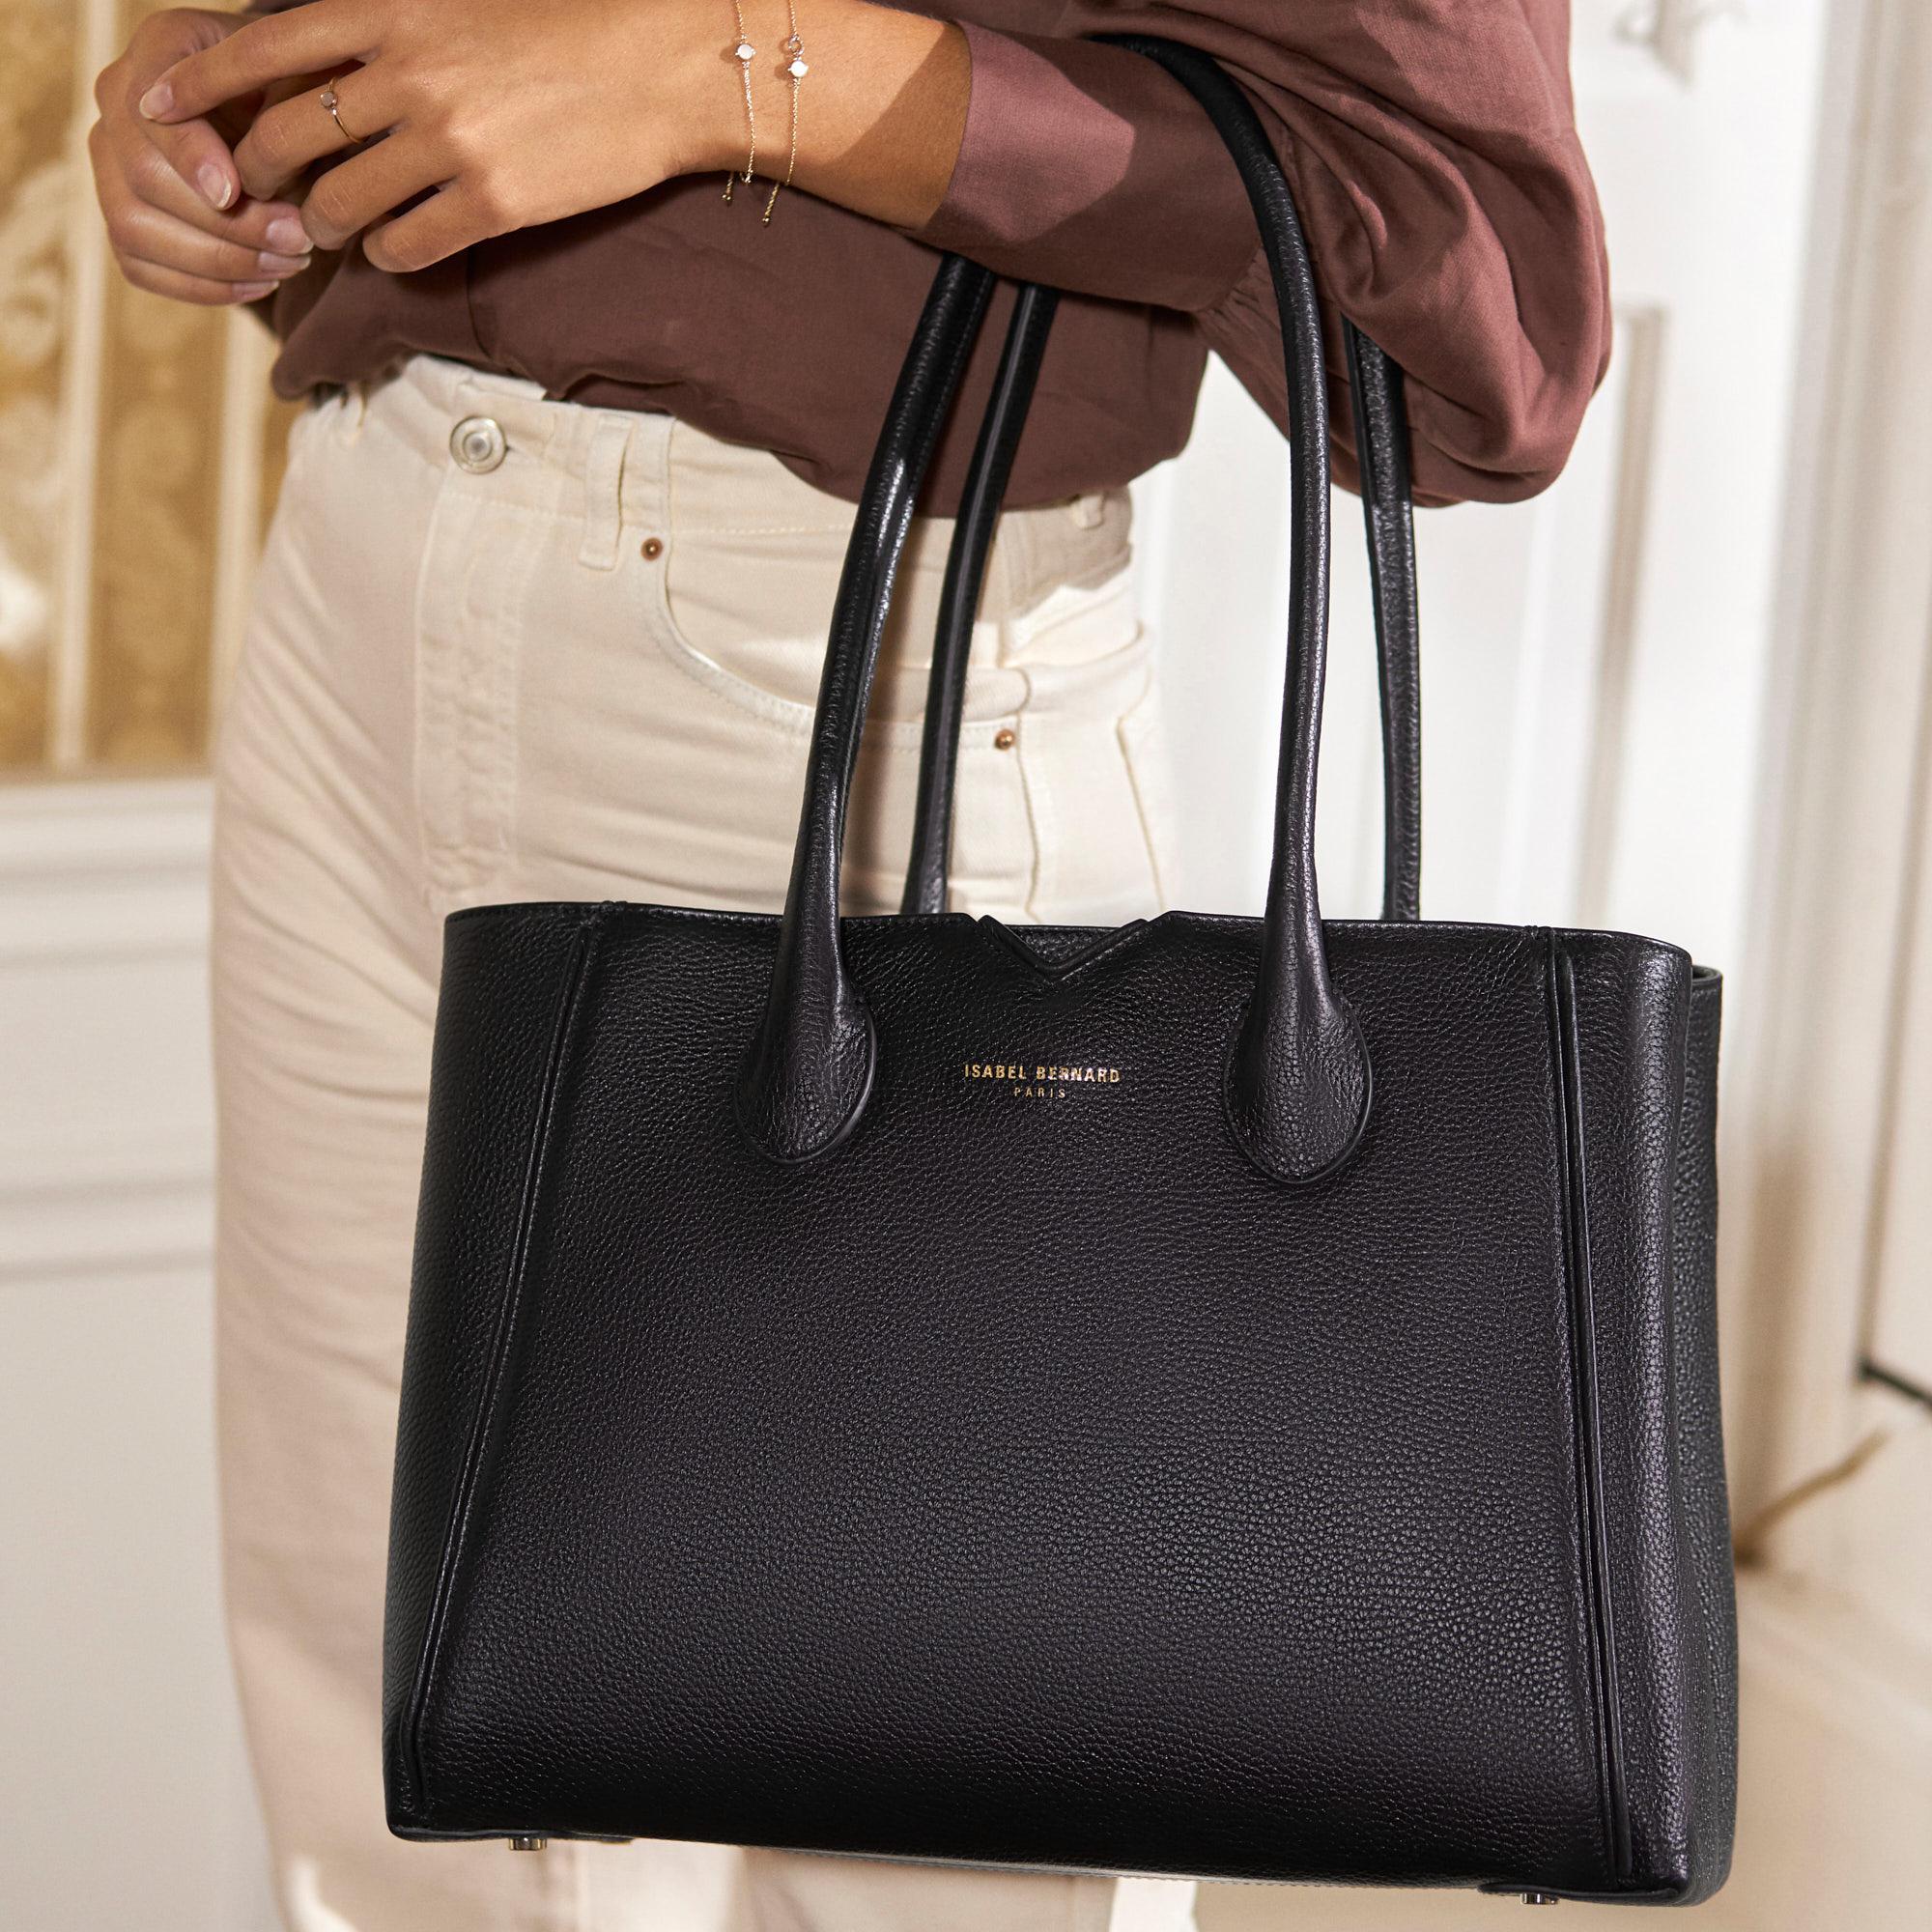 Isabel Bernard Honoré Cloe black calfskin leather handbag